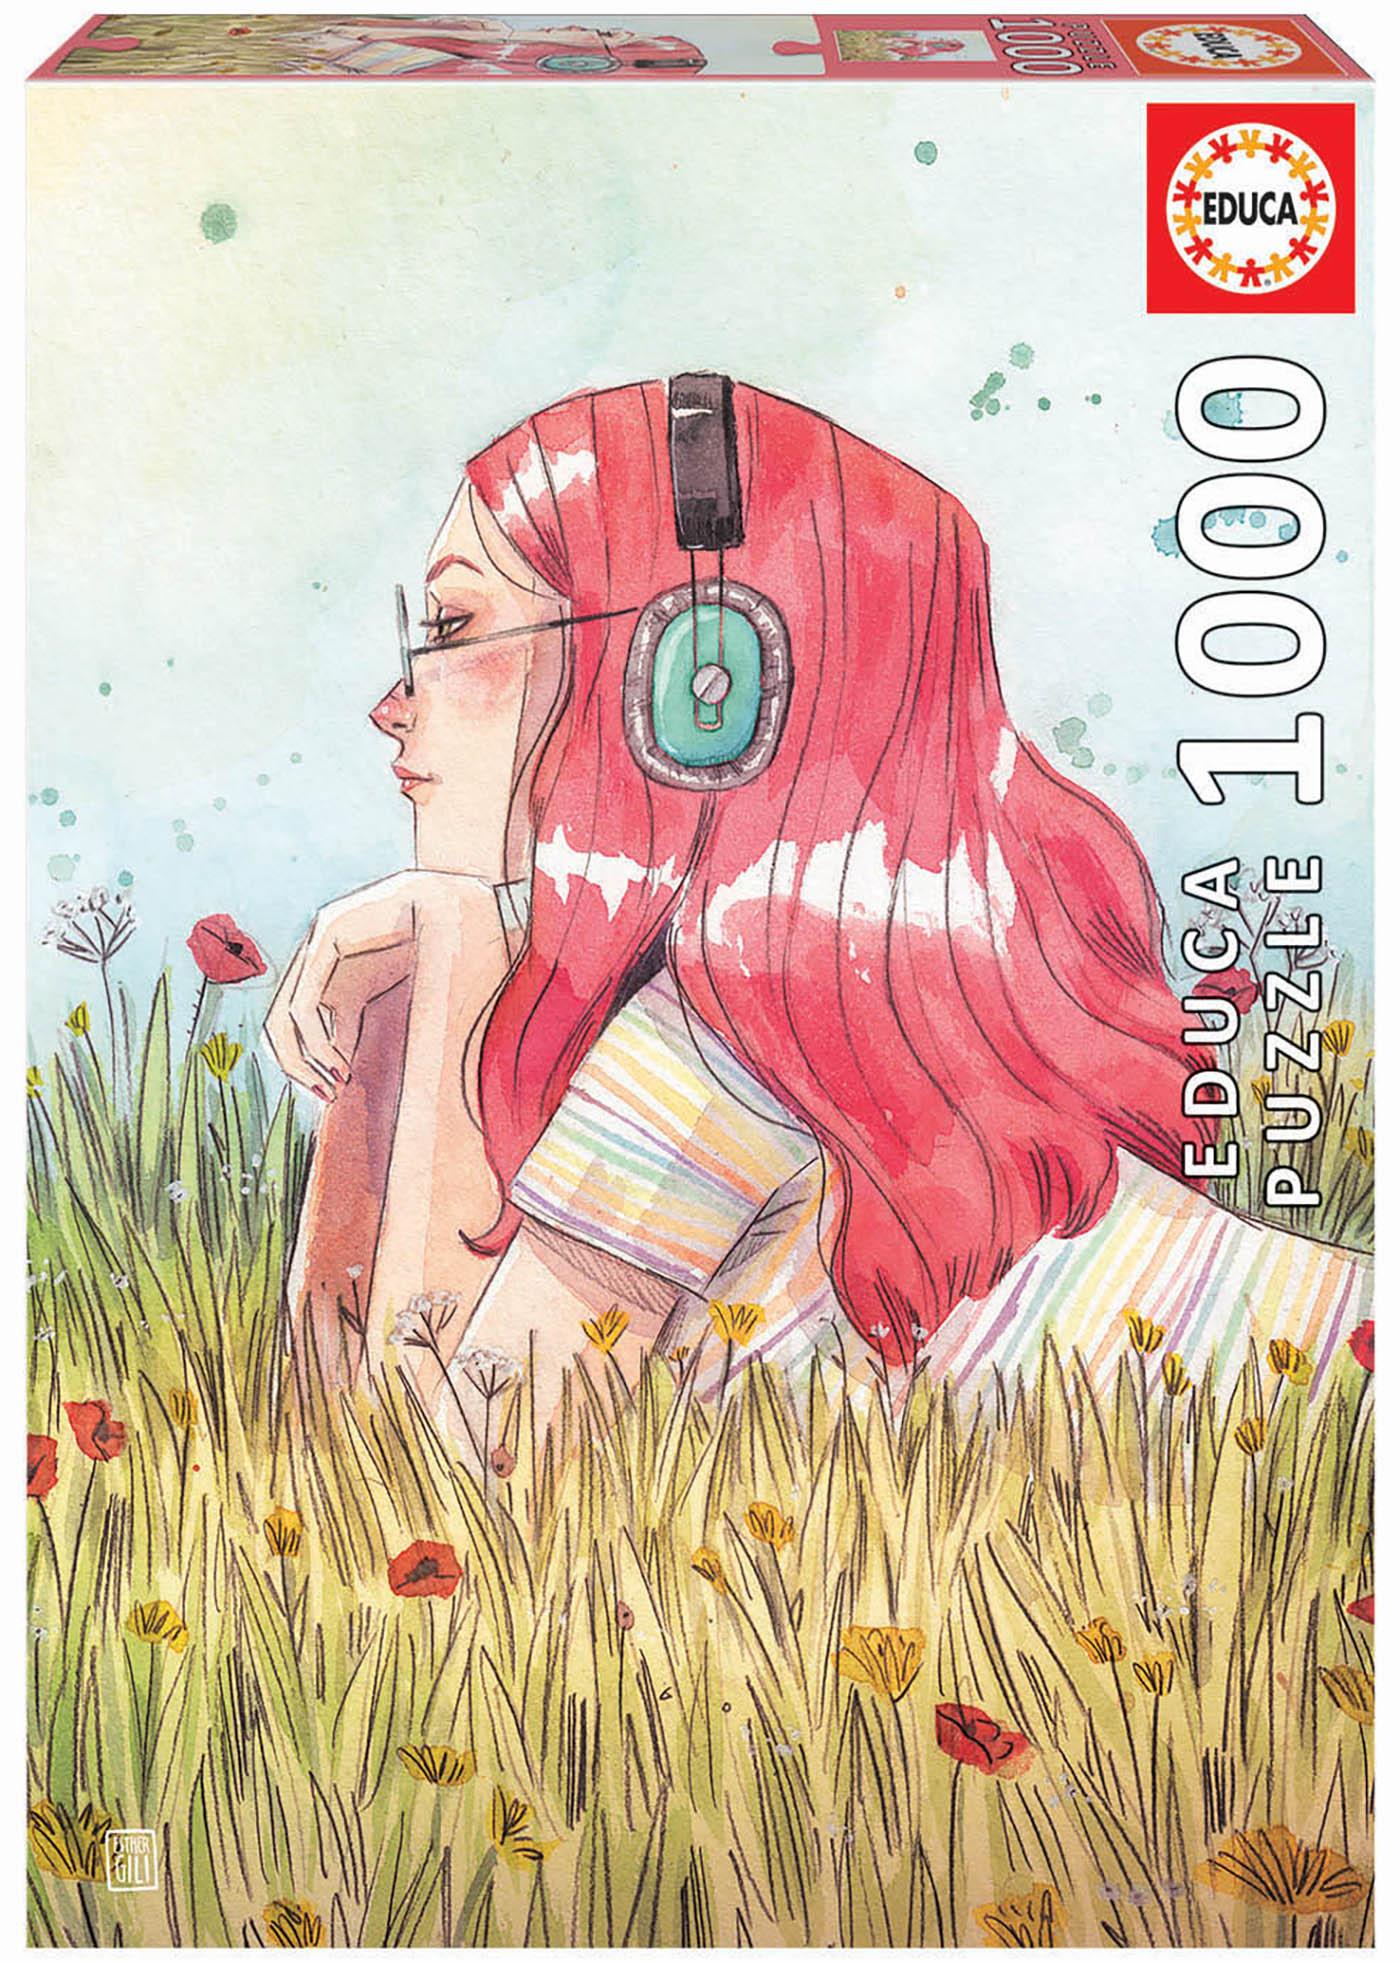 1000 June, Esther Gili